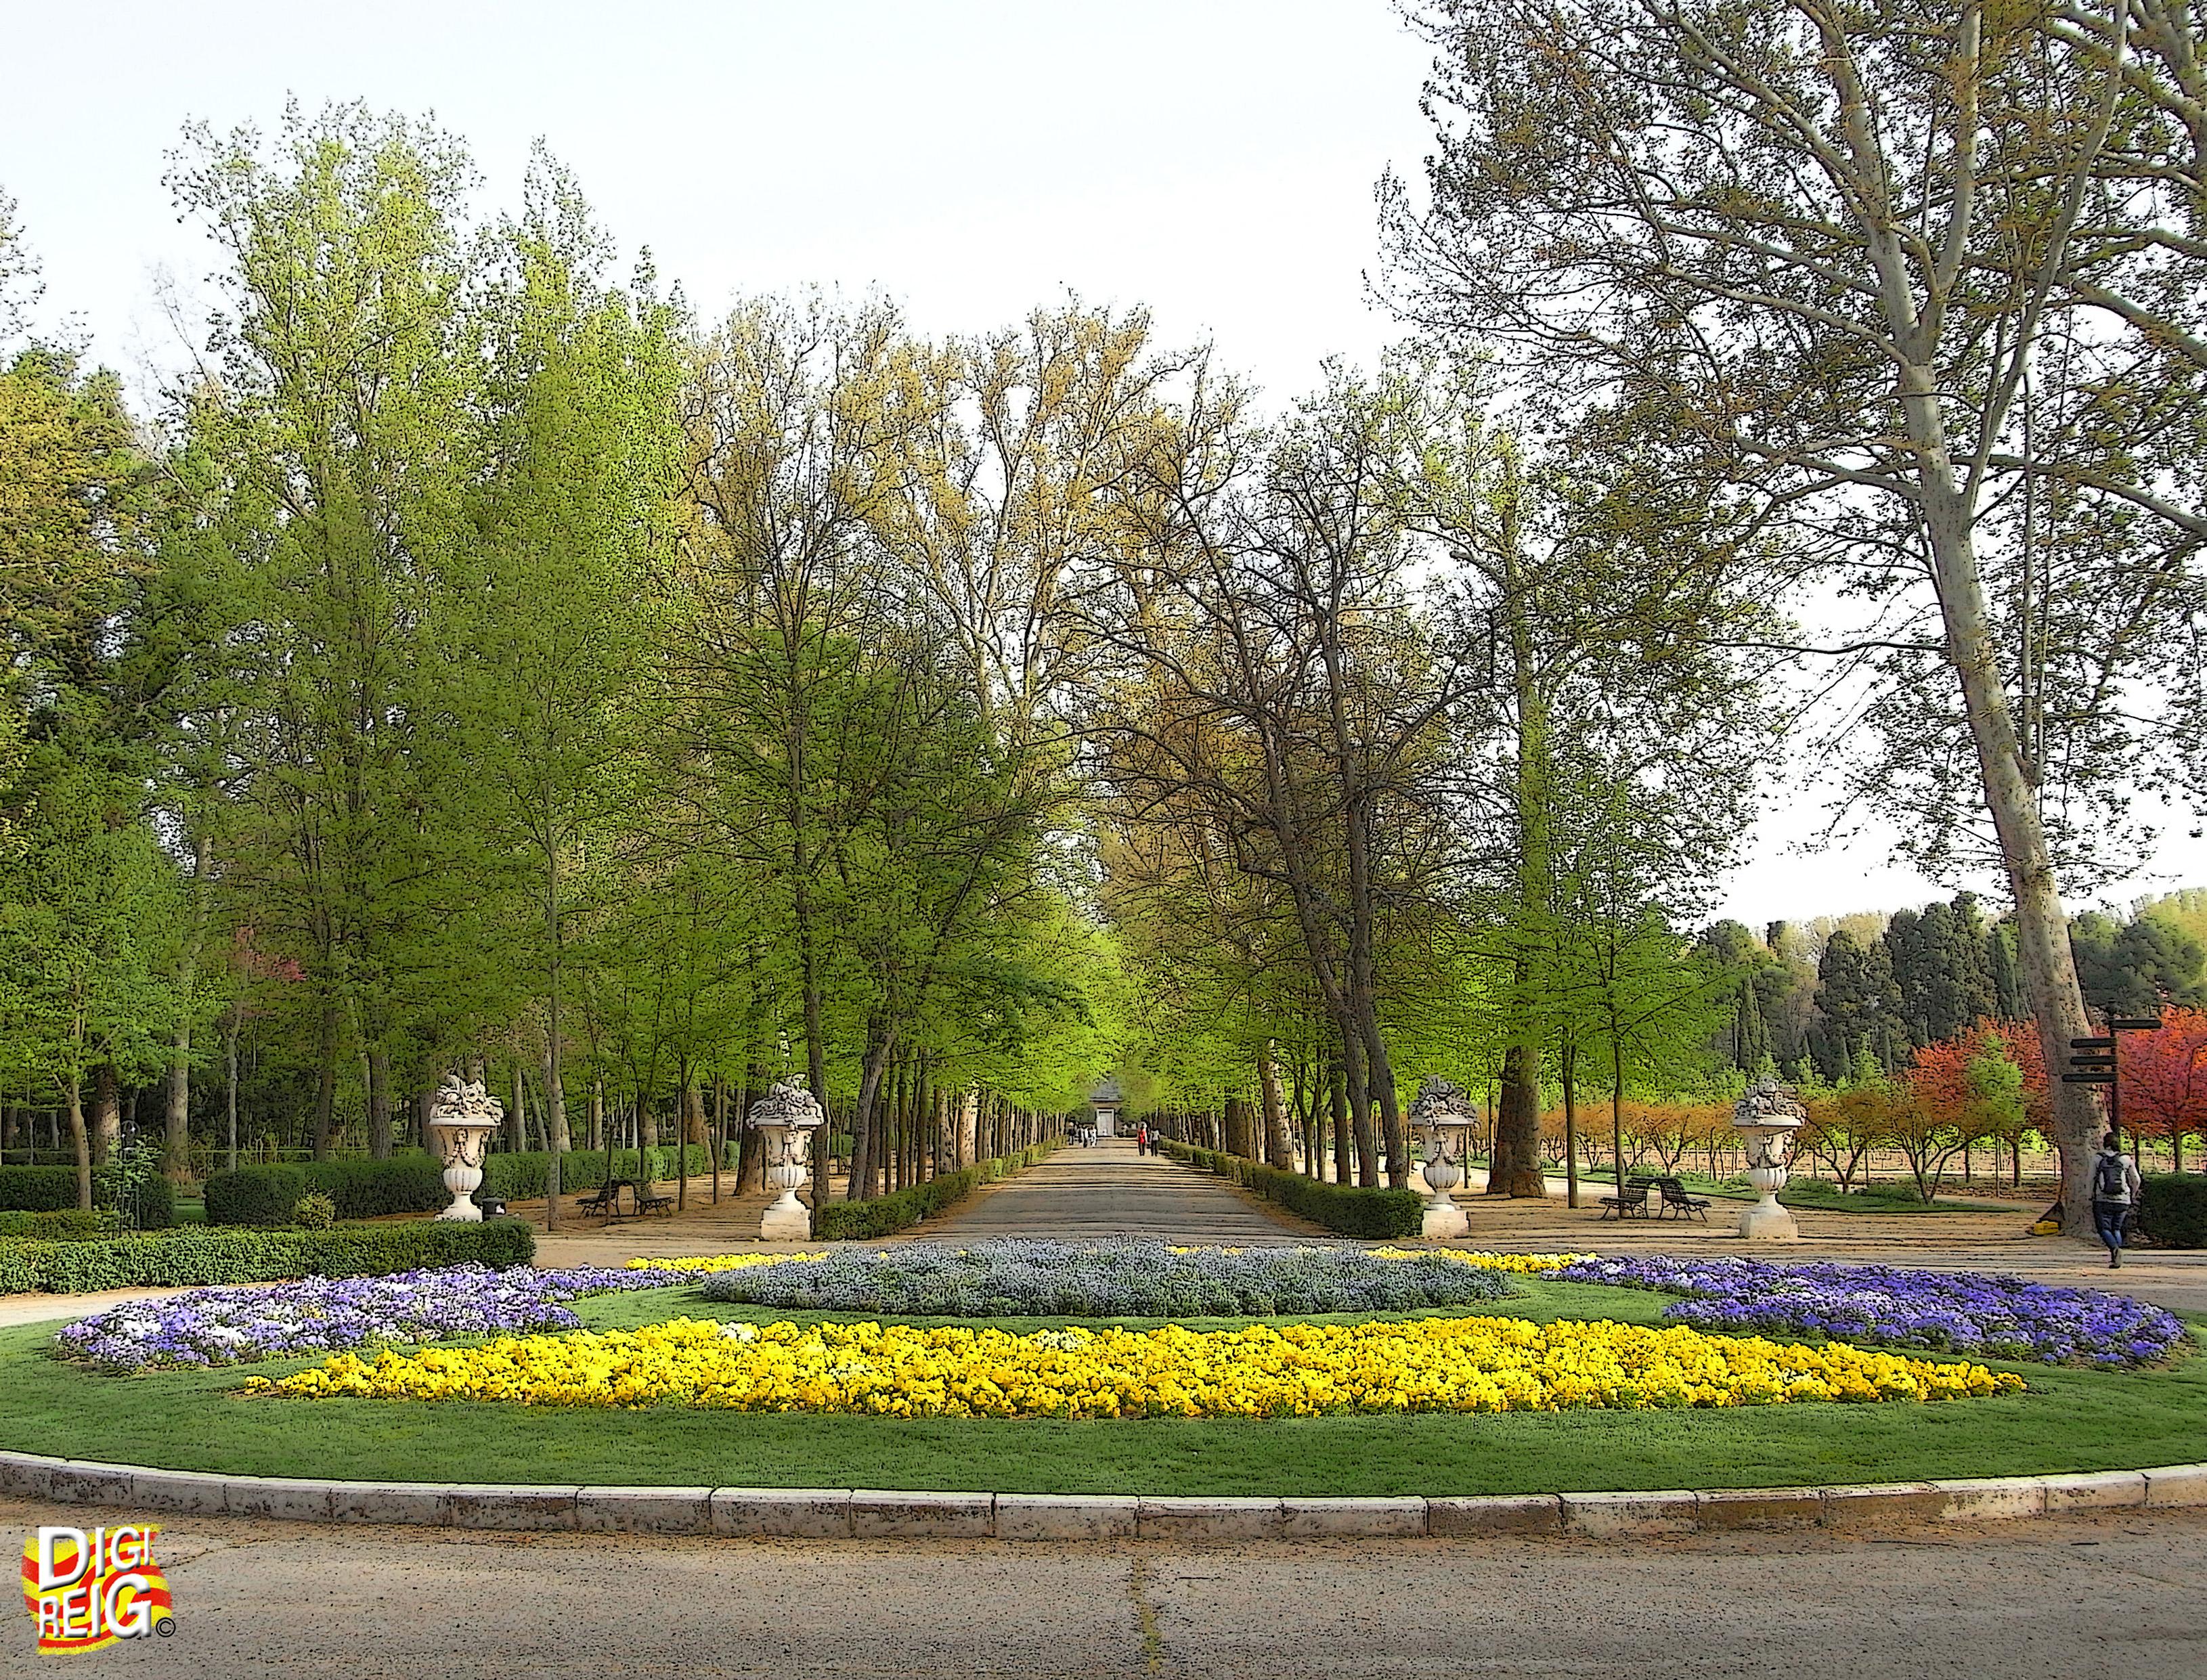 Foto jard n del pr ncipe 01 paseo aranjuez madrid espa a - Jardin del principe aranjuez ...